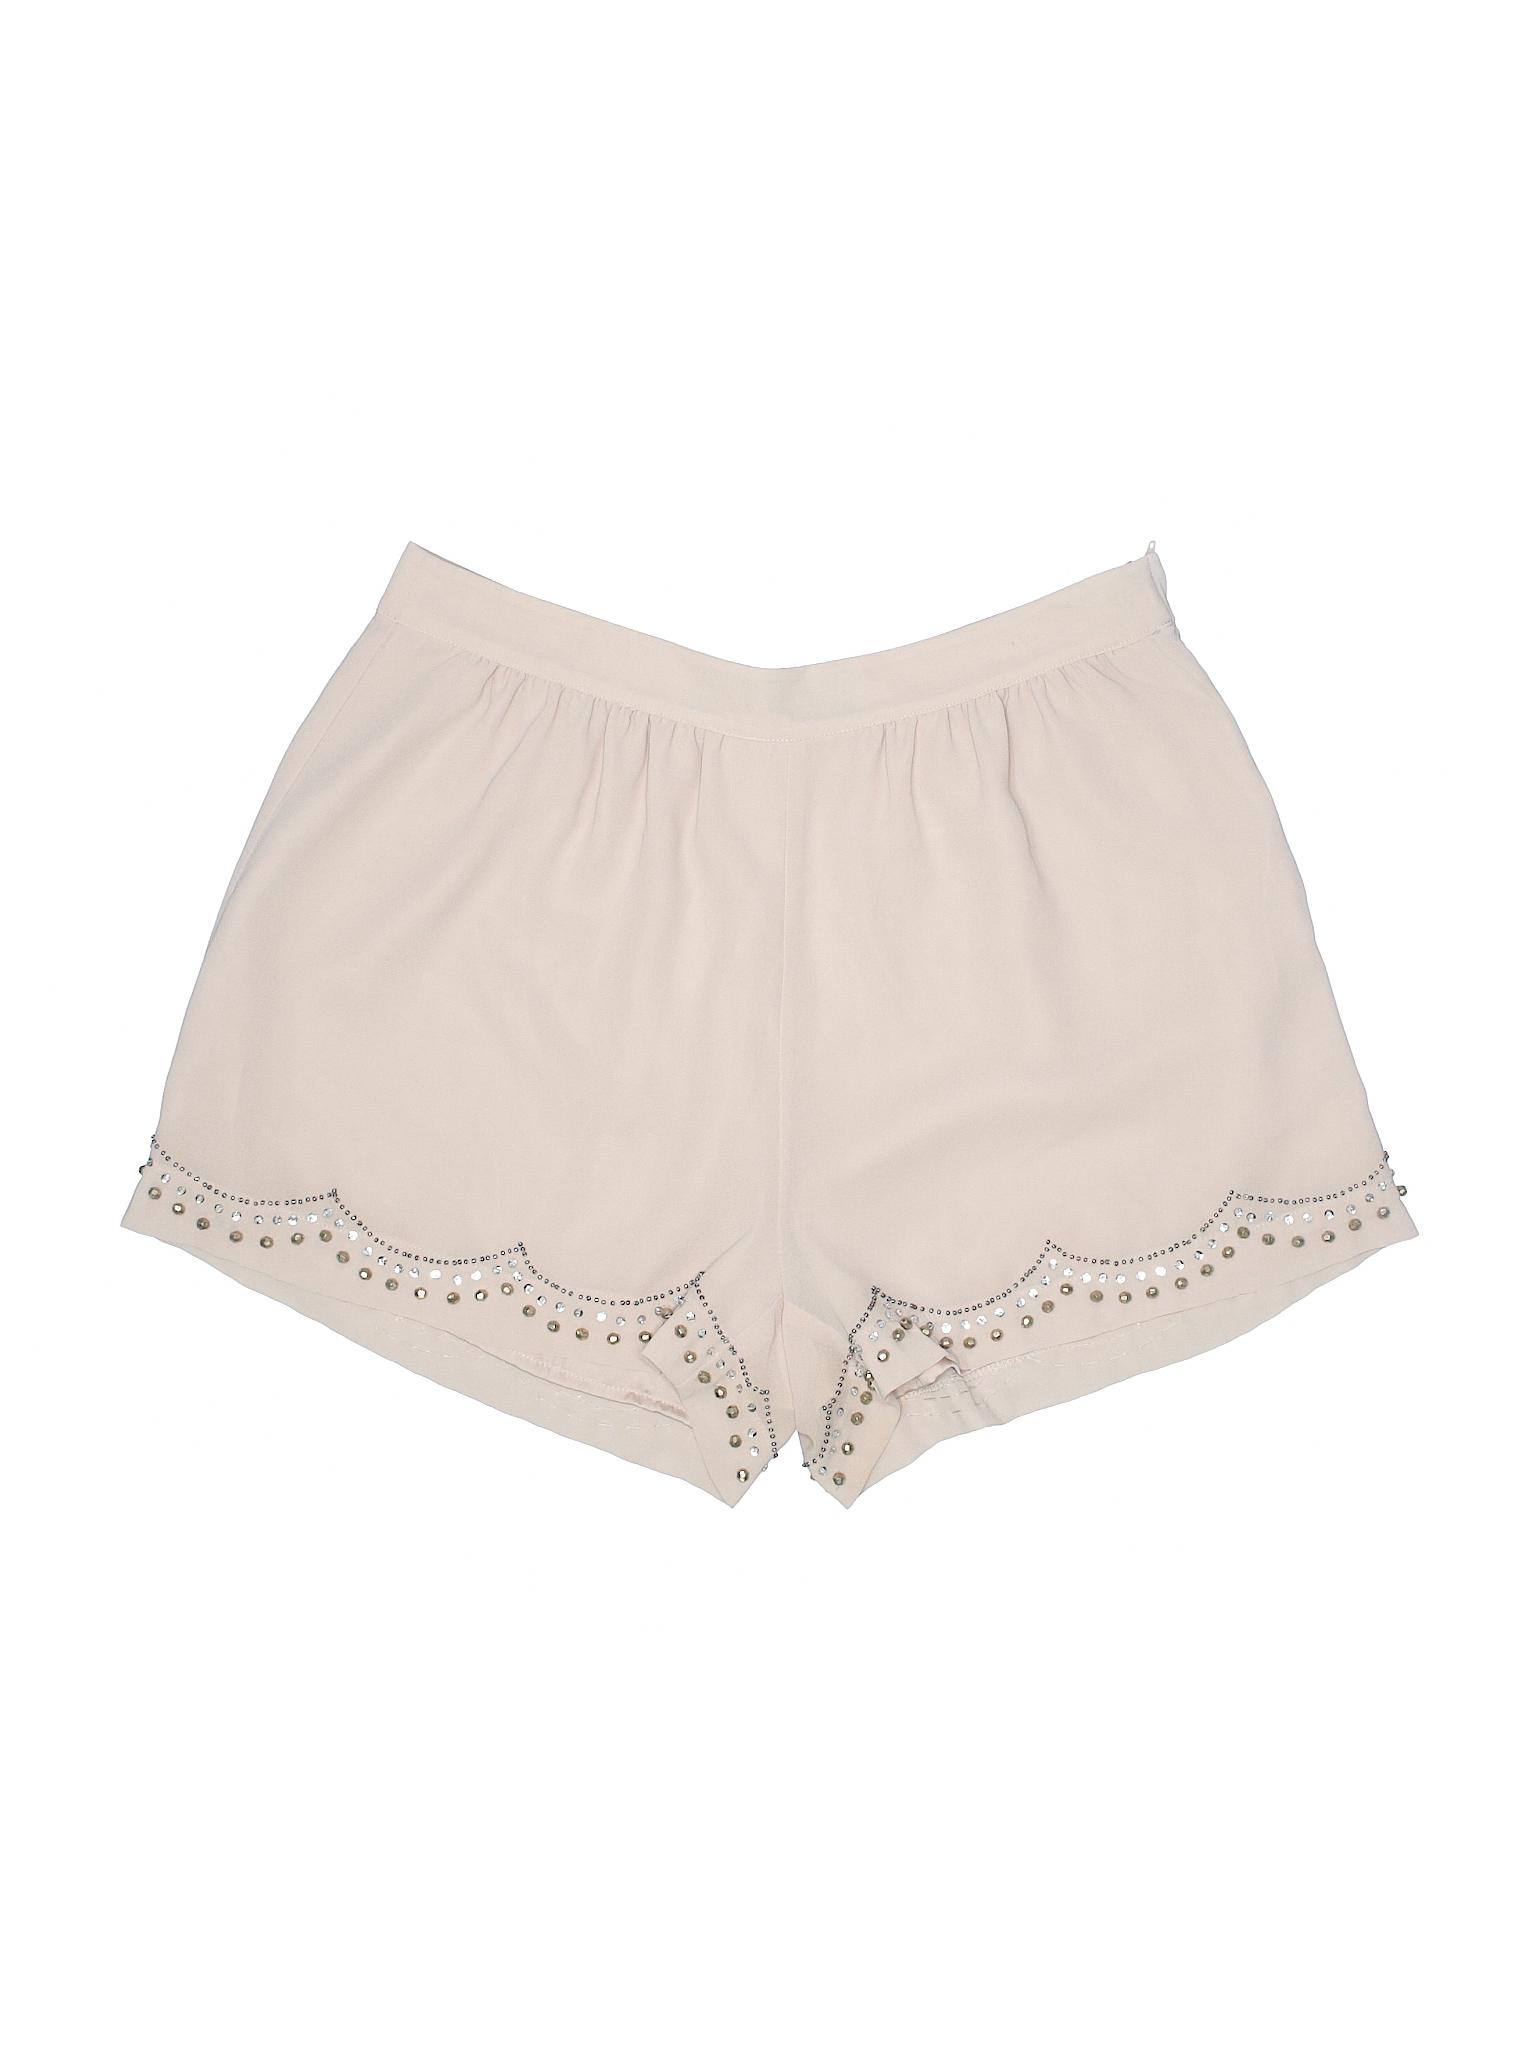 Dressy H Boutique Shorts leisure amp;M pftxB